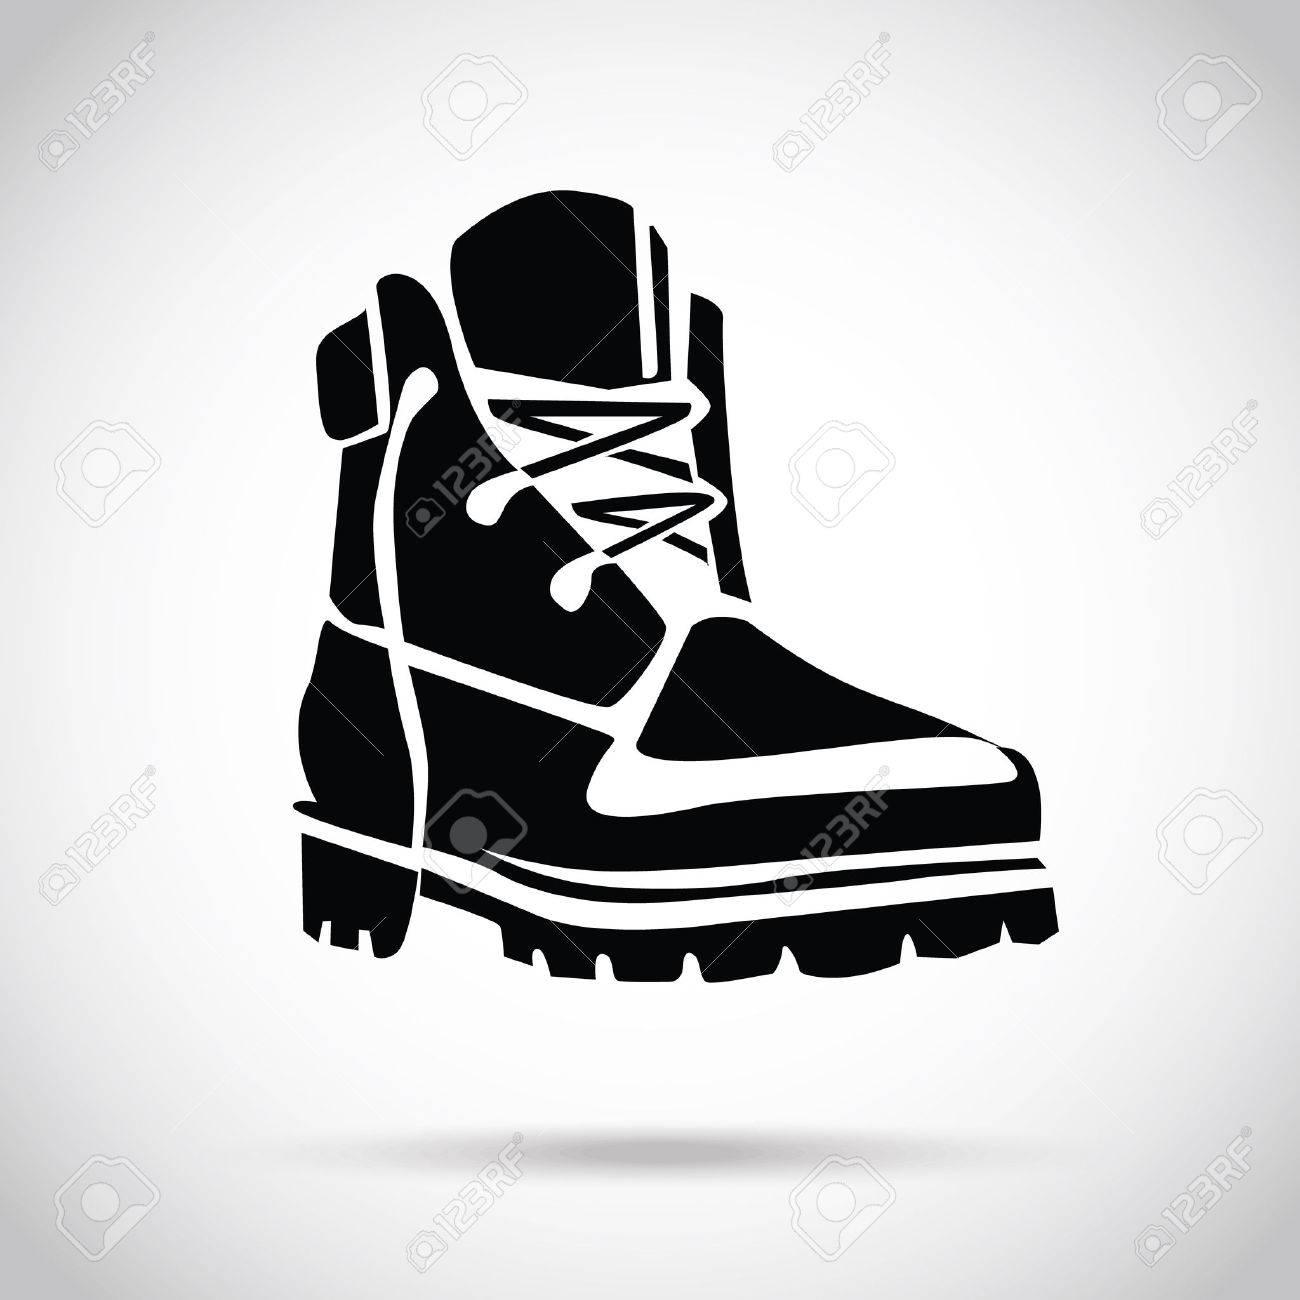 Black boot icon - 37352499